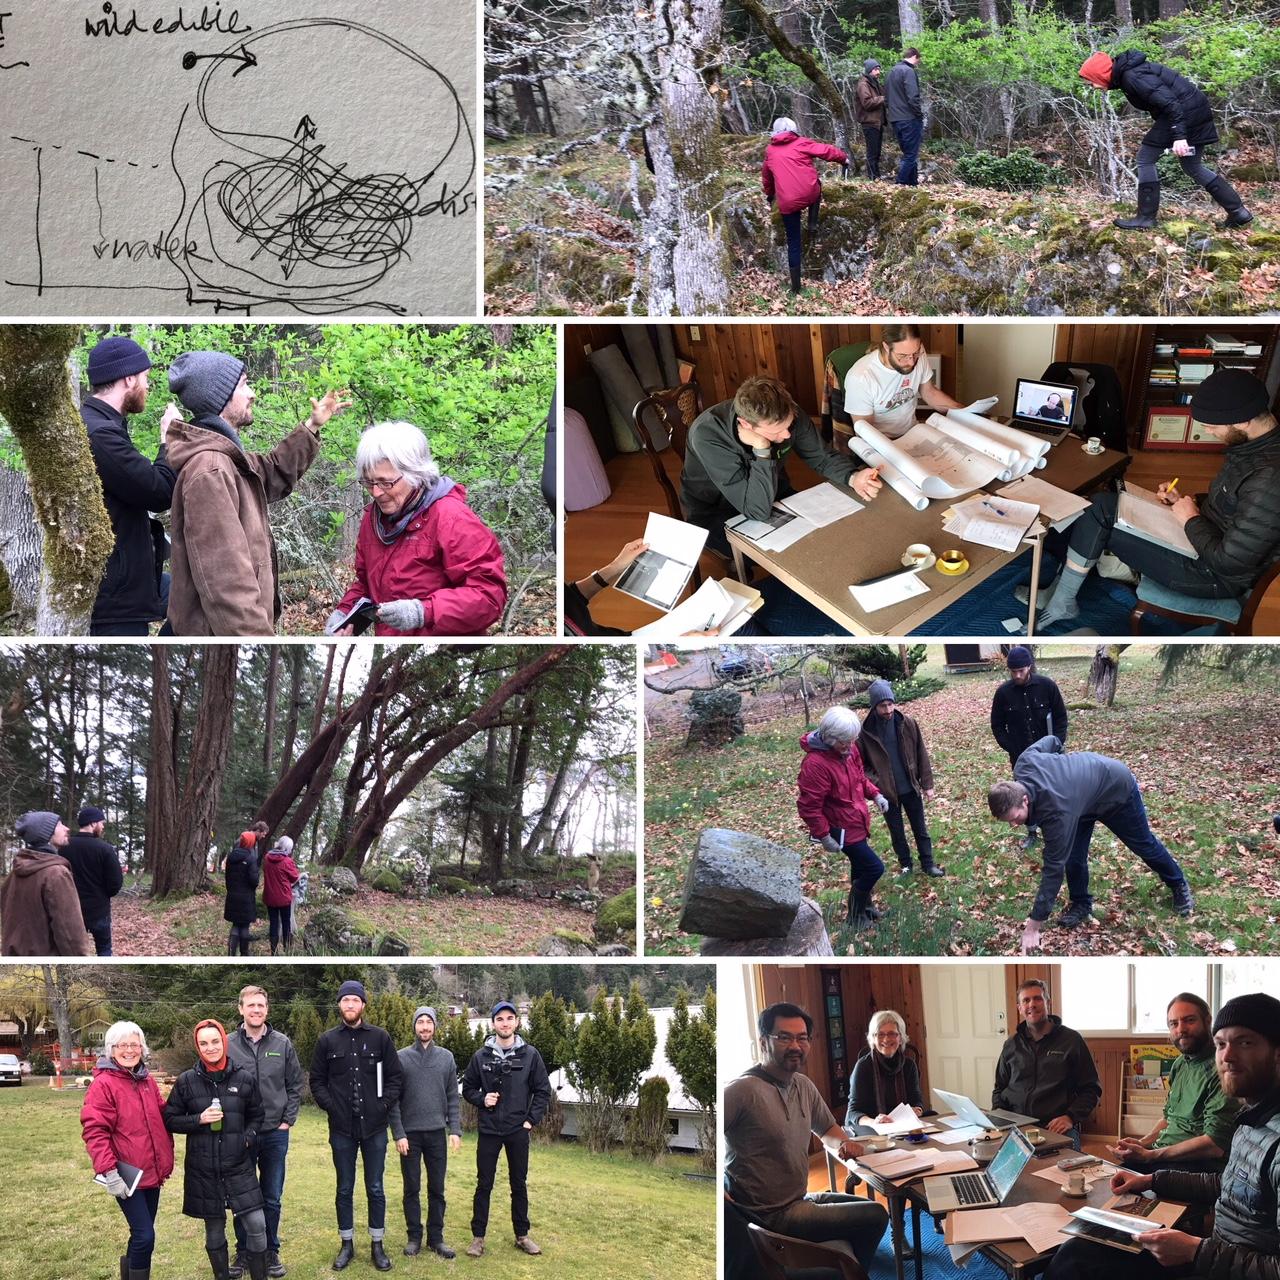 On-Site Biophilia Exploration Day, March 29, 2018, Design Team Members: Victoria Drakeford (Landscape Architect), Kurtis Howes (Lunarbloom Perma-culture), Ross Wood (Design Team Leader), Mark Bernhardt (Bernhardt Contracting), Fiona McLagan, (Co-Founder/Anat Baniel Method Practioner), Hajo Meijer, (CPHD, Special Guest), Kenneth Chooi (C0-Founder, Architect AIBC), Sam Van Hell (Arcas Media), Jack Kitchener (NIDO Design).